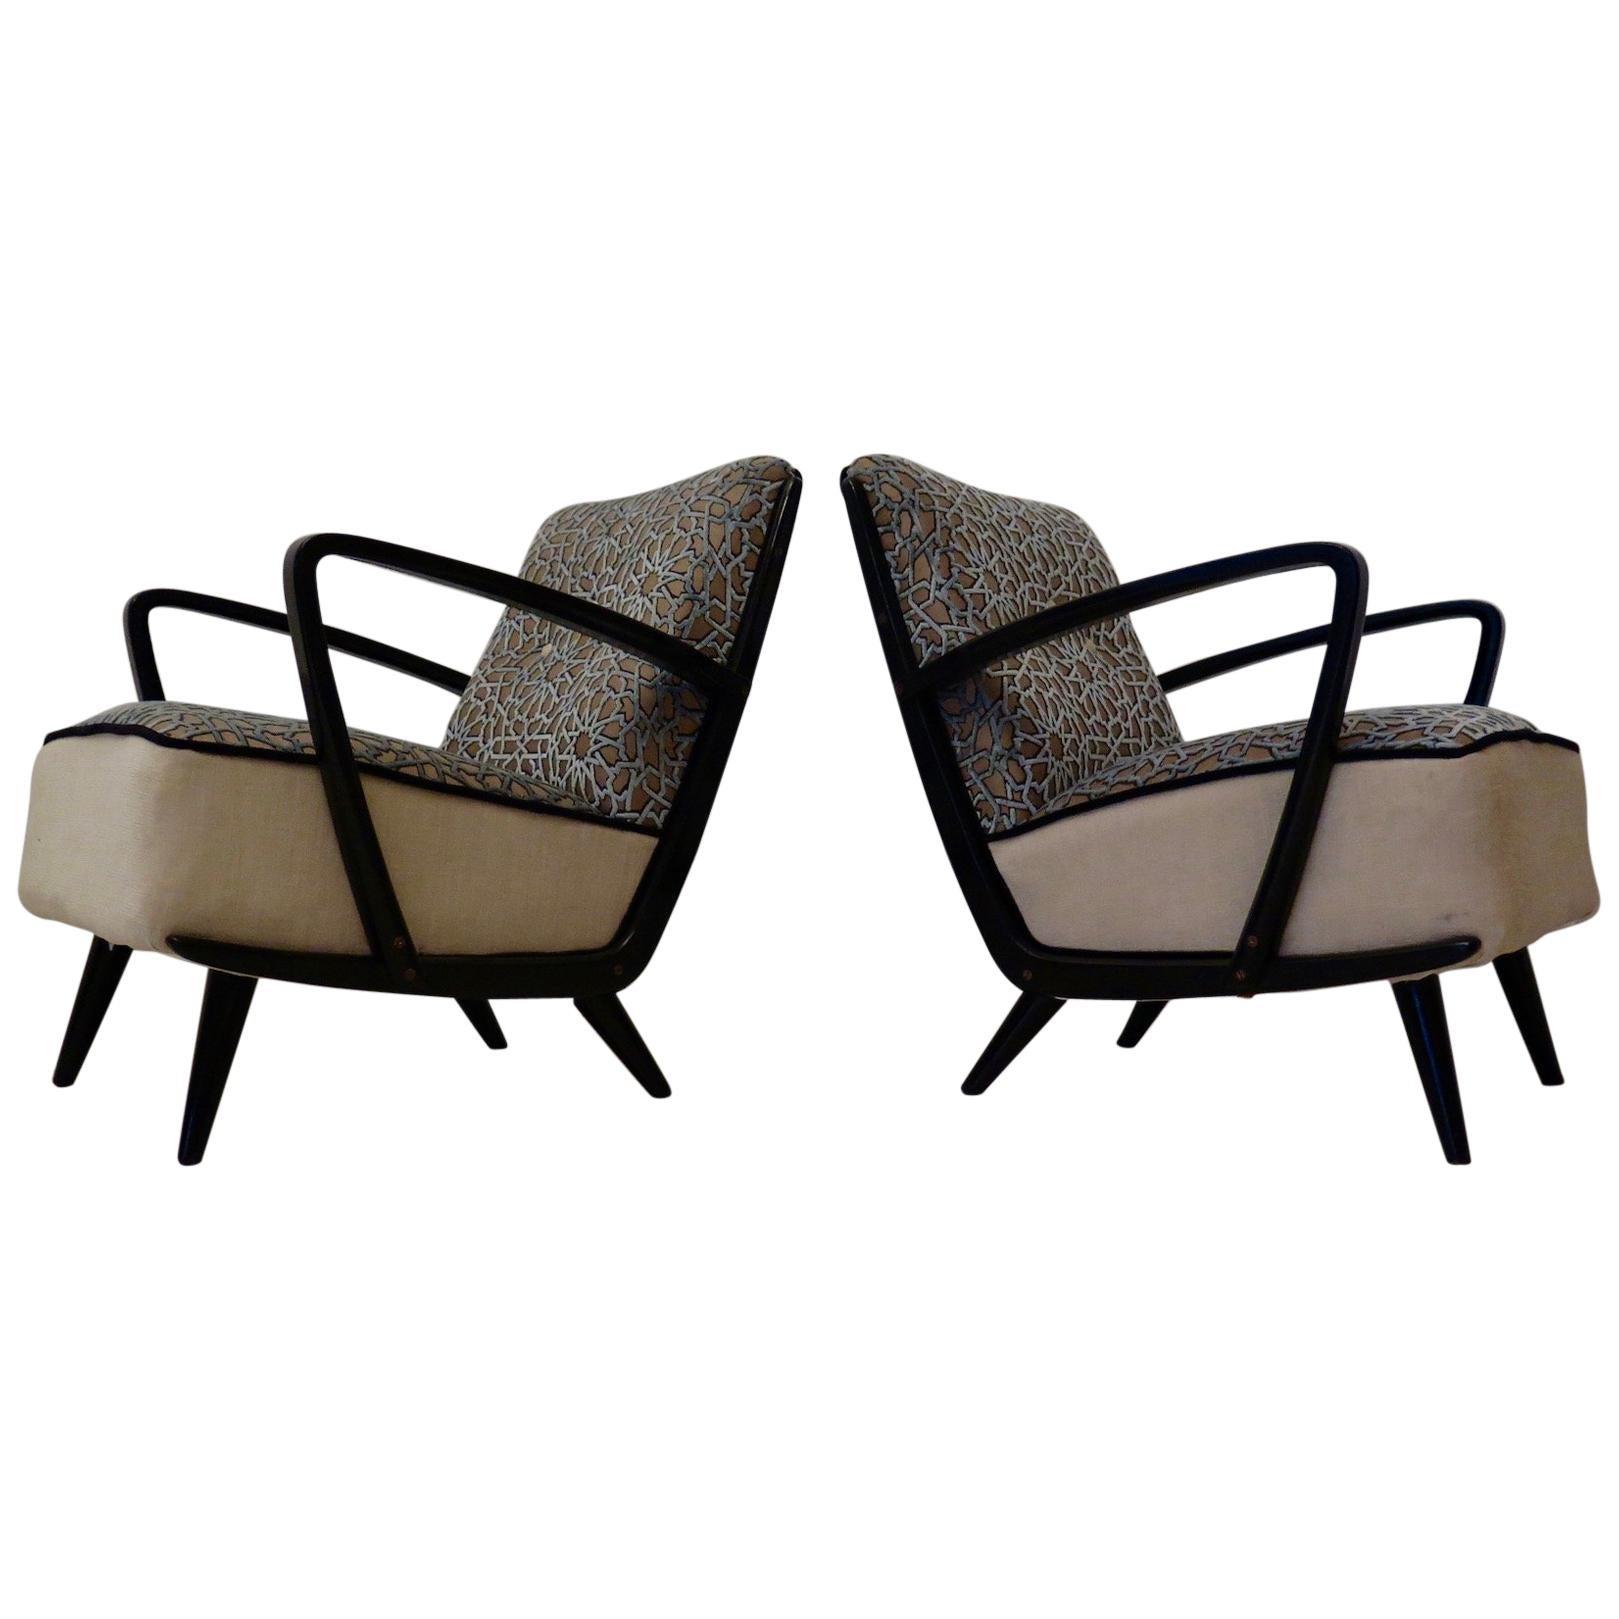 Pairs of Midcentury Combined Velvet and Beech Wood Italian Armchairs, 1950